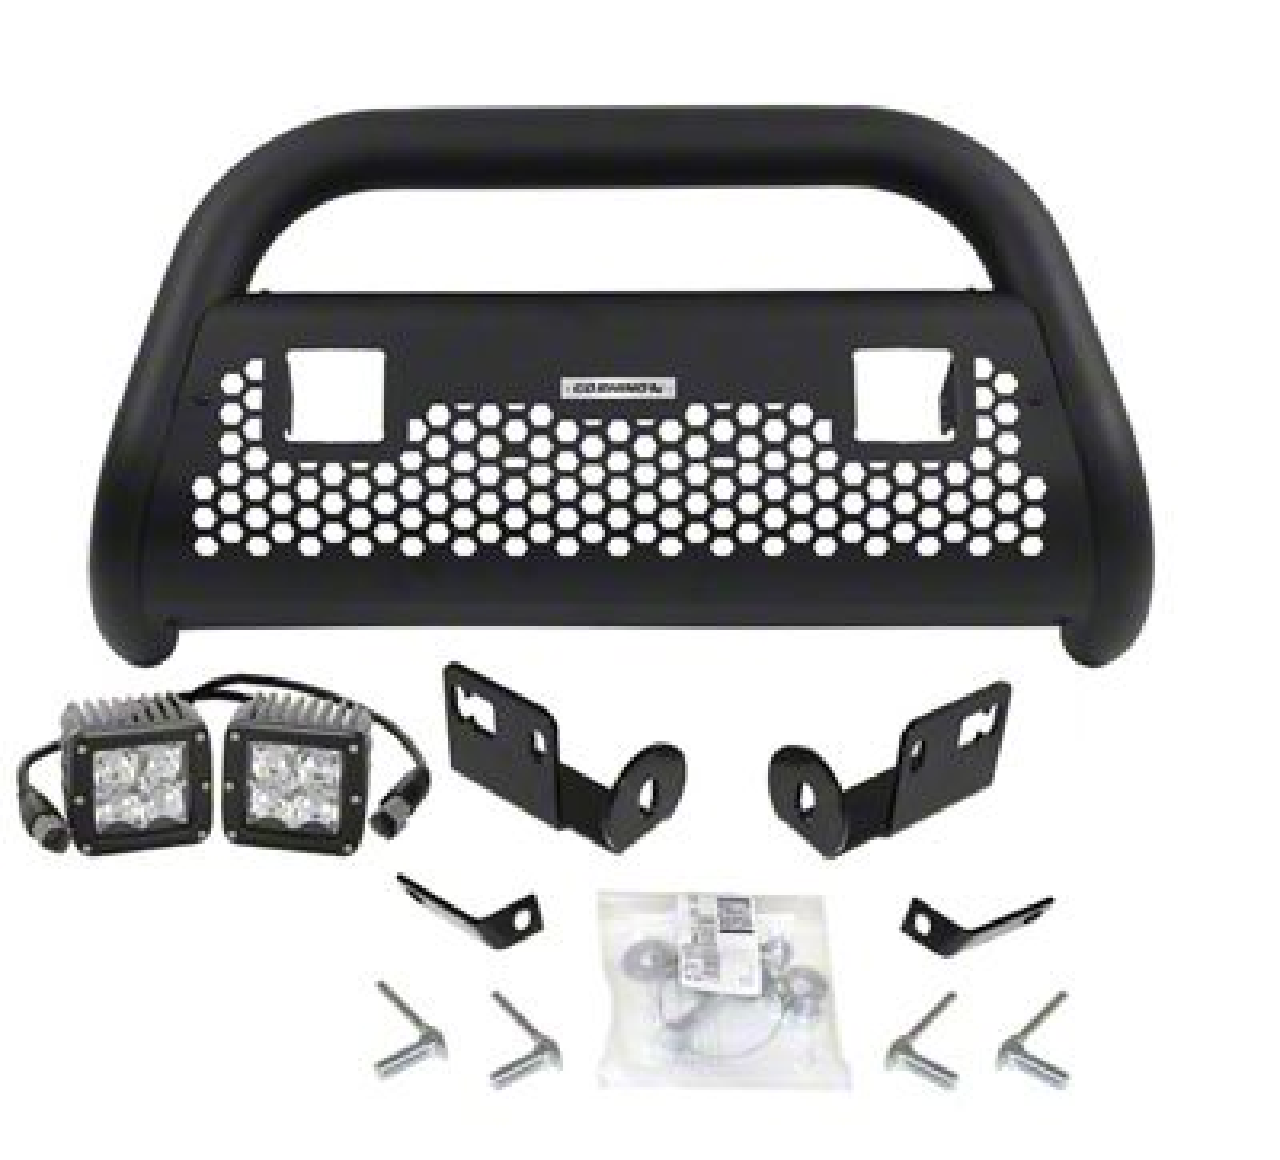 Go Rhino RC2 LR Bull Bar w/ Two LED Cube Light Mounting Brackets - Textured Black (05-15 Tacoma, Excluding TRD)